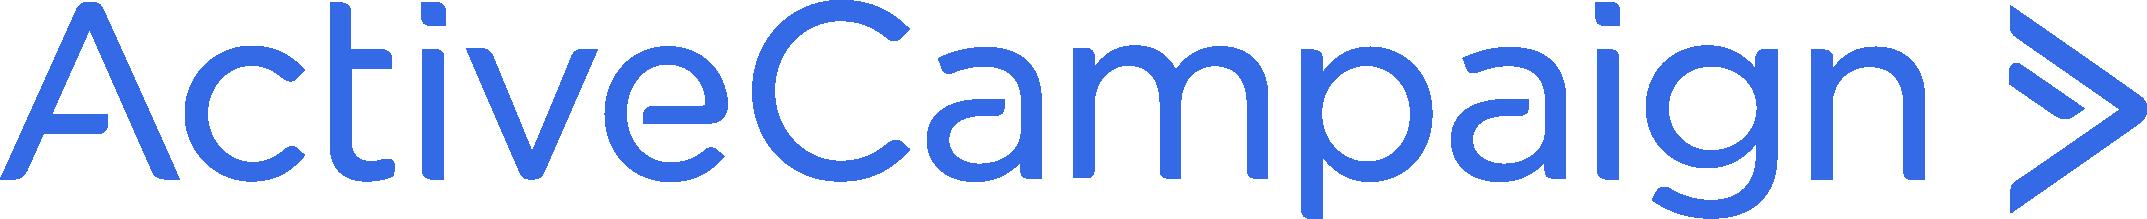 ac_logo-blue-trans